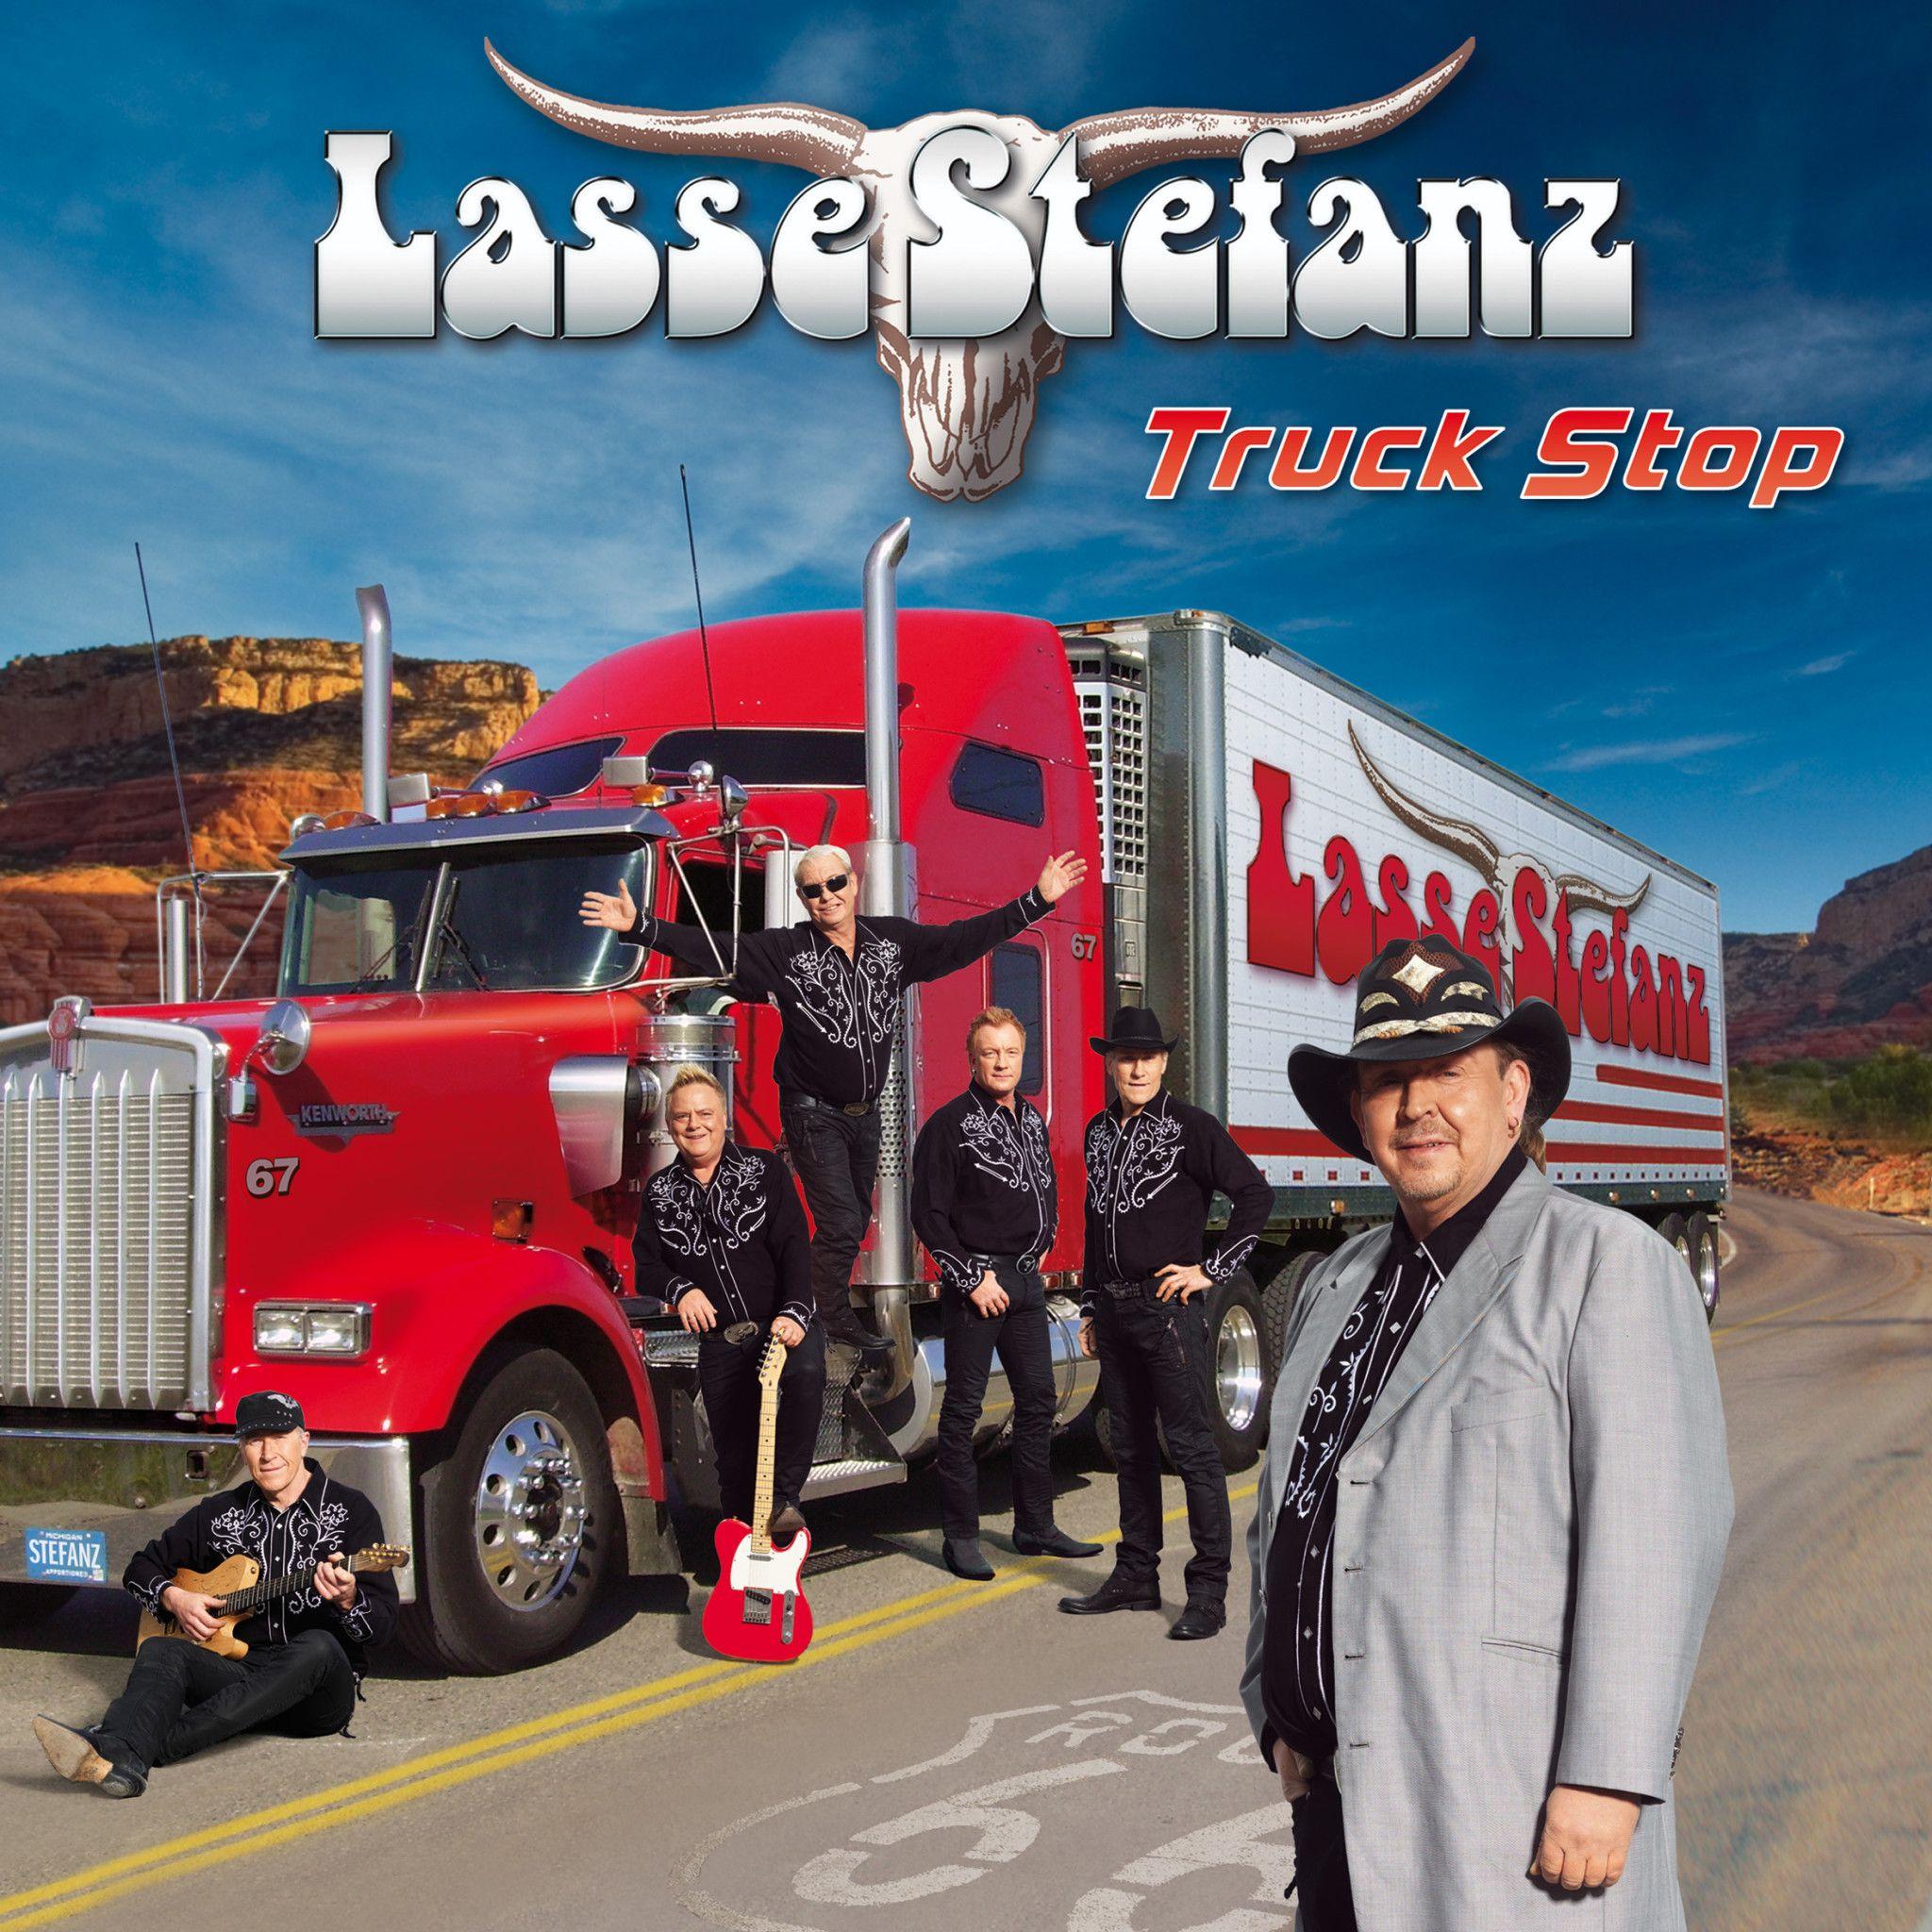 Lasse Stefanz - Truck Stop album cover